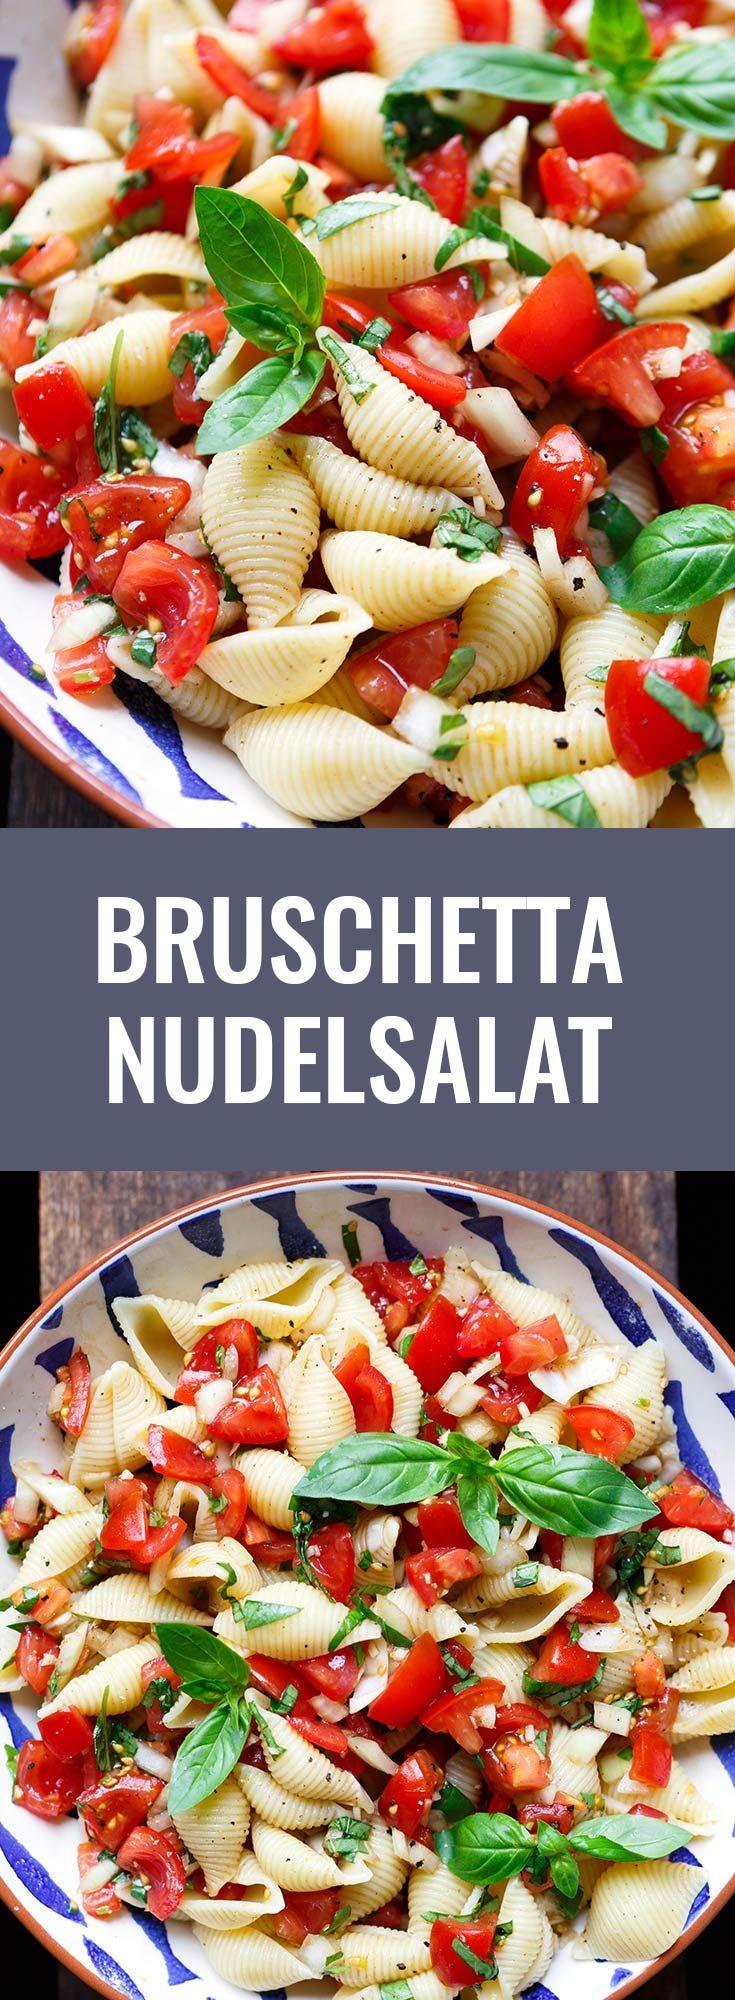 Bruschetta Nudelsalat (Super einfach!) - Kochkarussell #fall